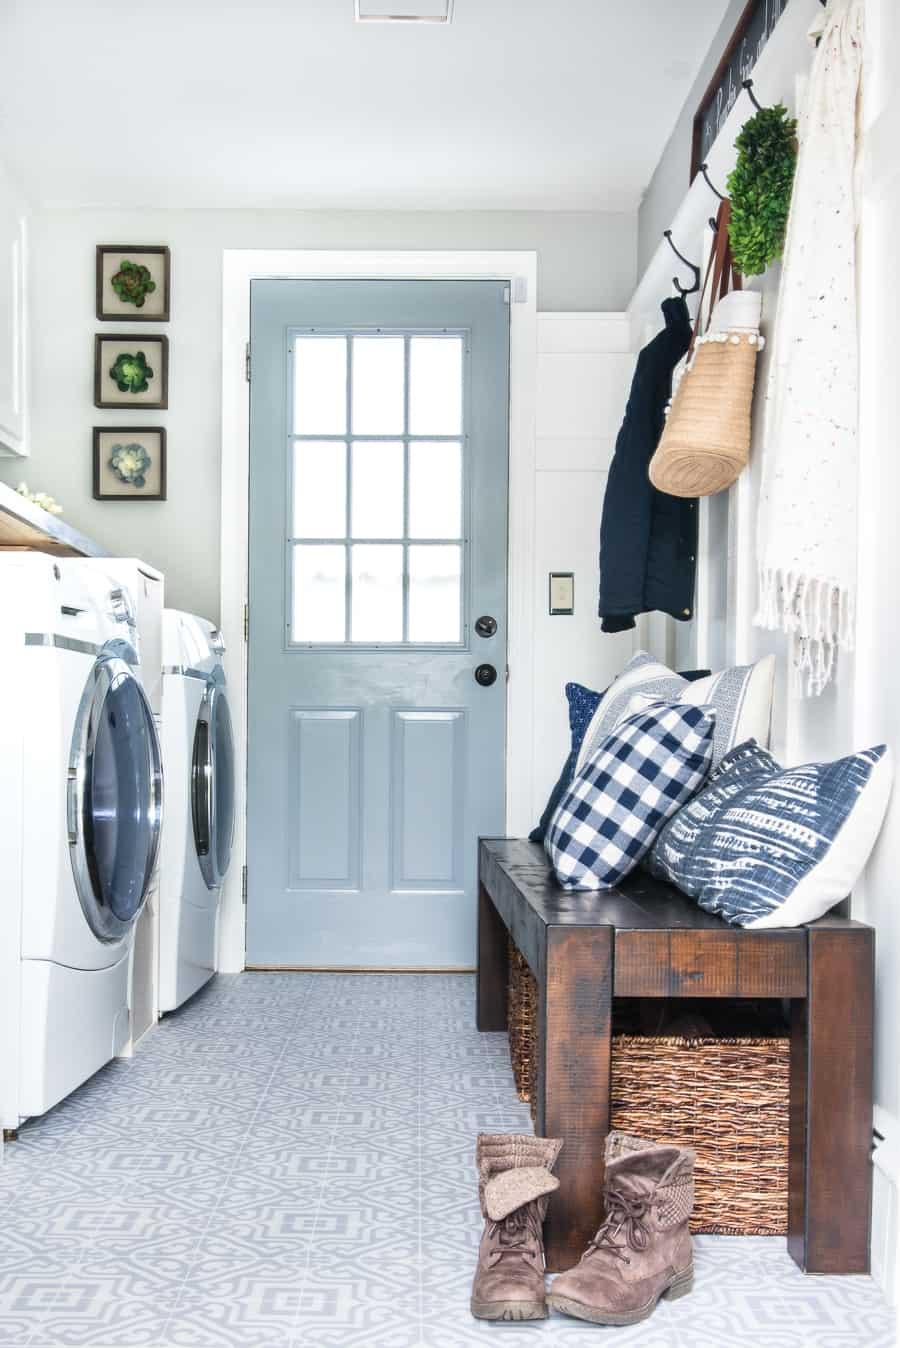 small laundry room ideas and photos